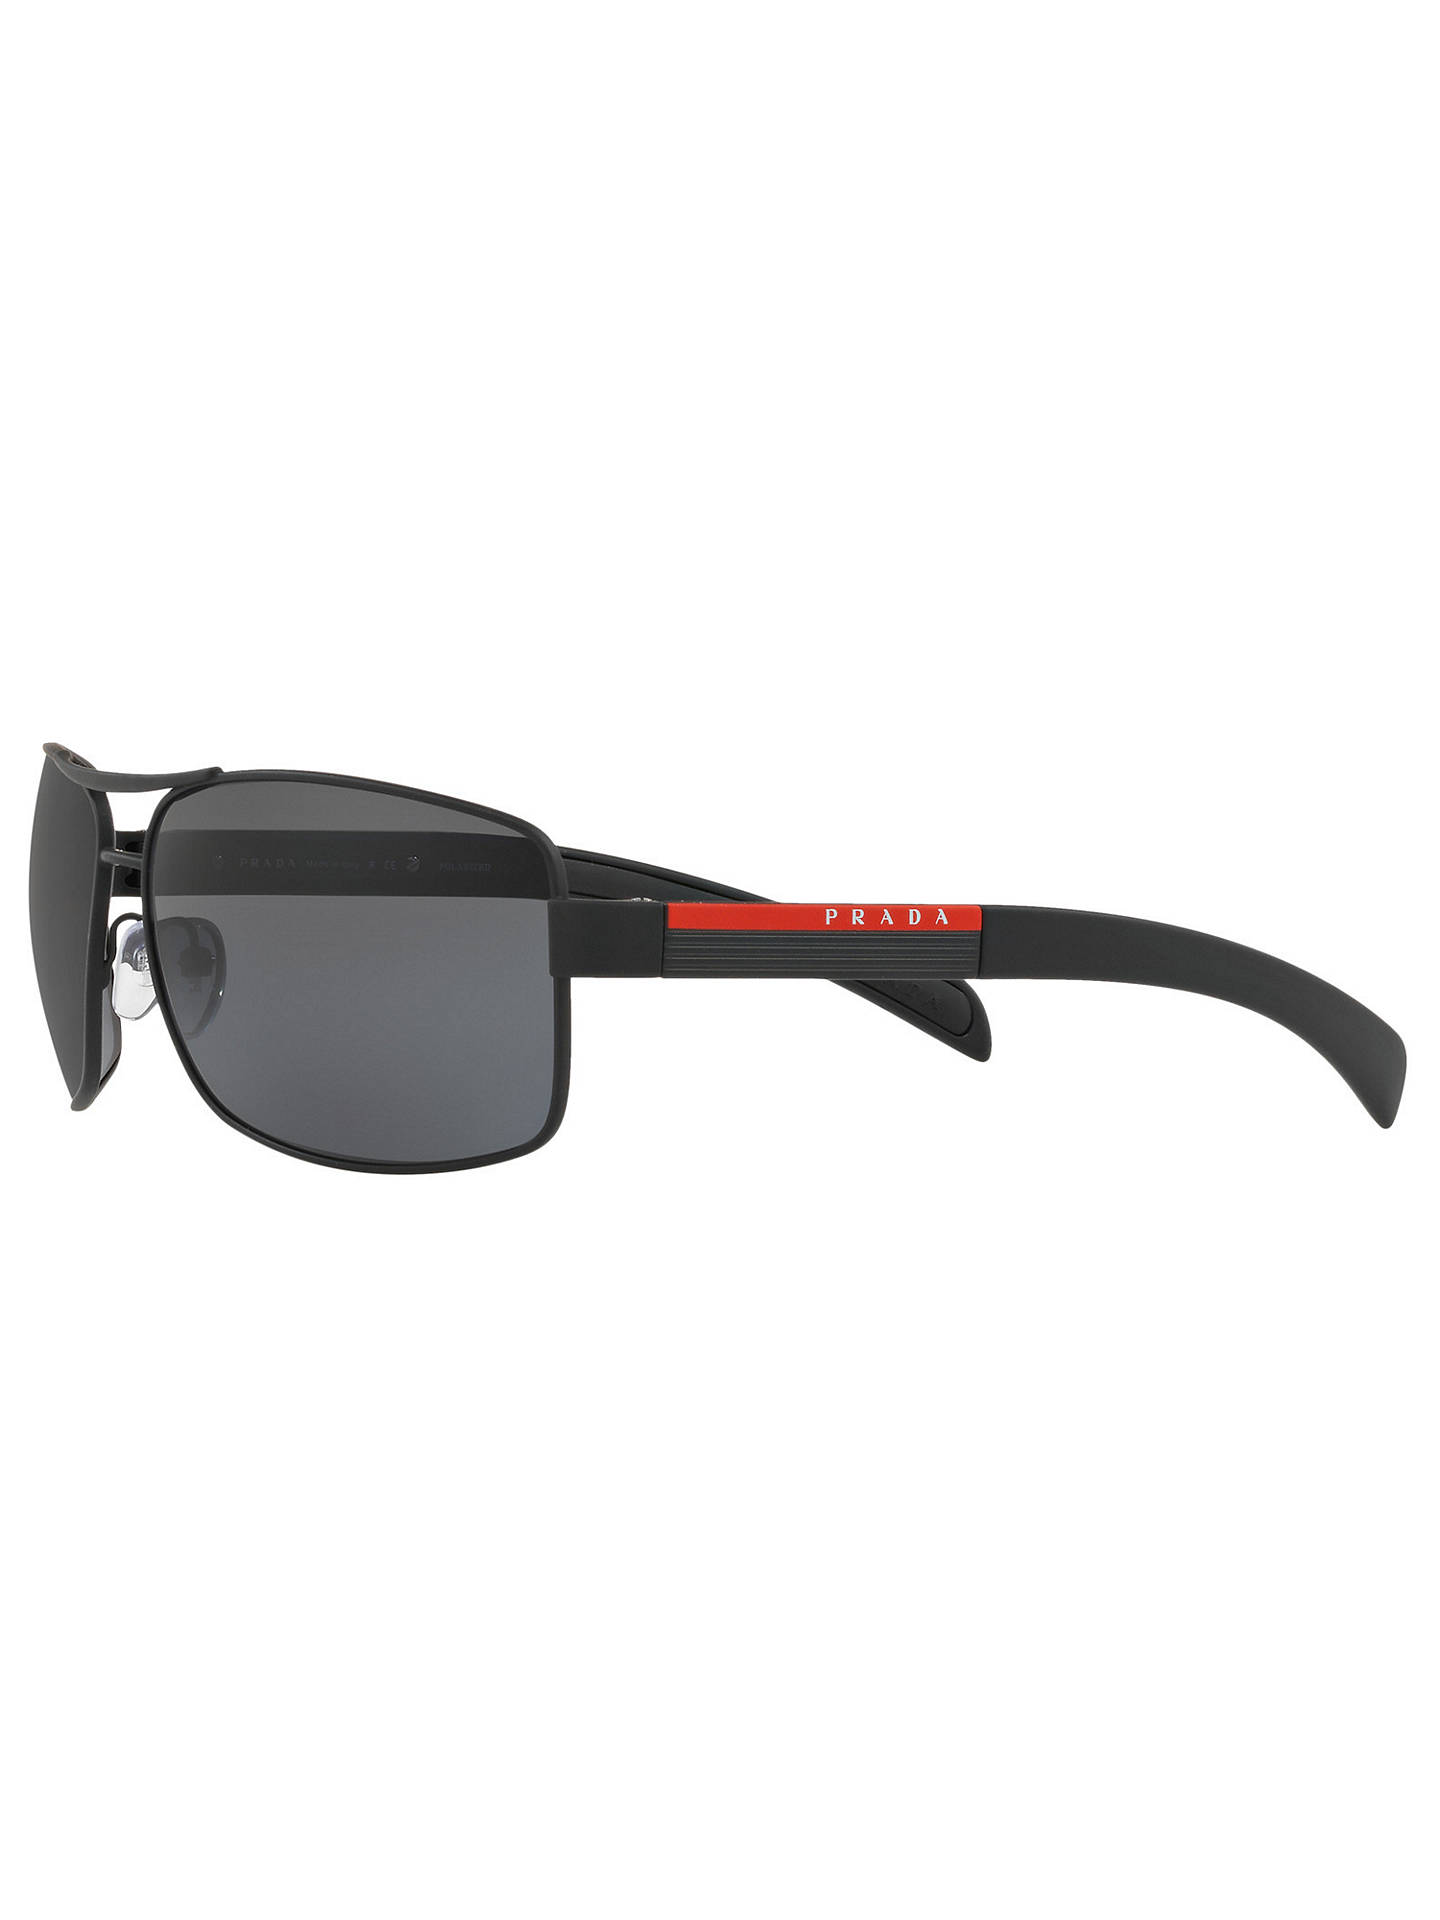 b4d2f5eca03 Prada Linea Rossa PS 54IS Polarised Rectangular Sunglasses at John ...